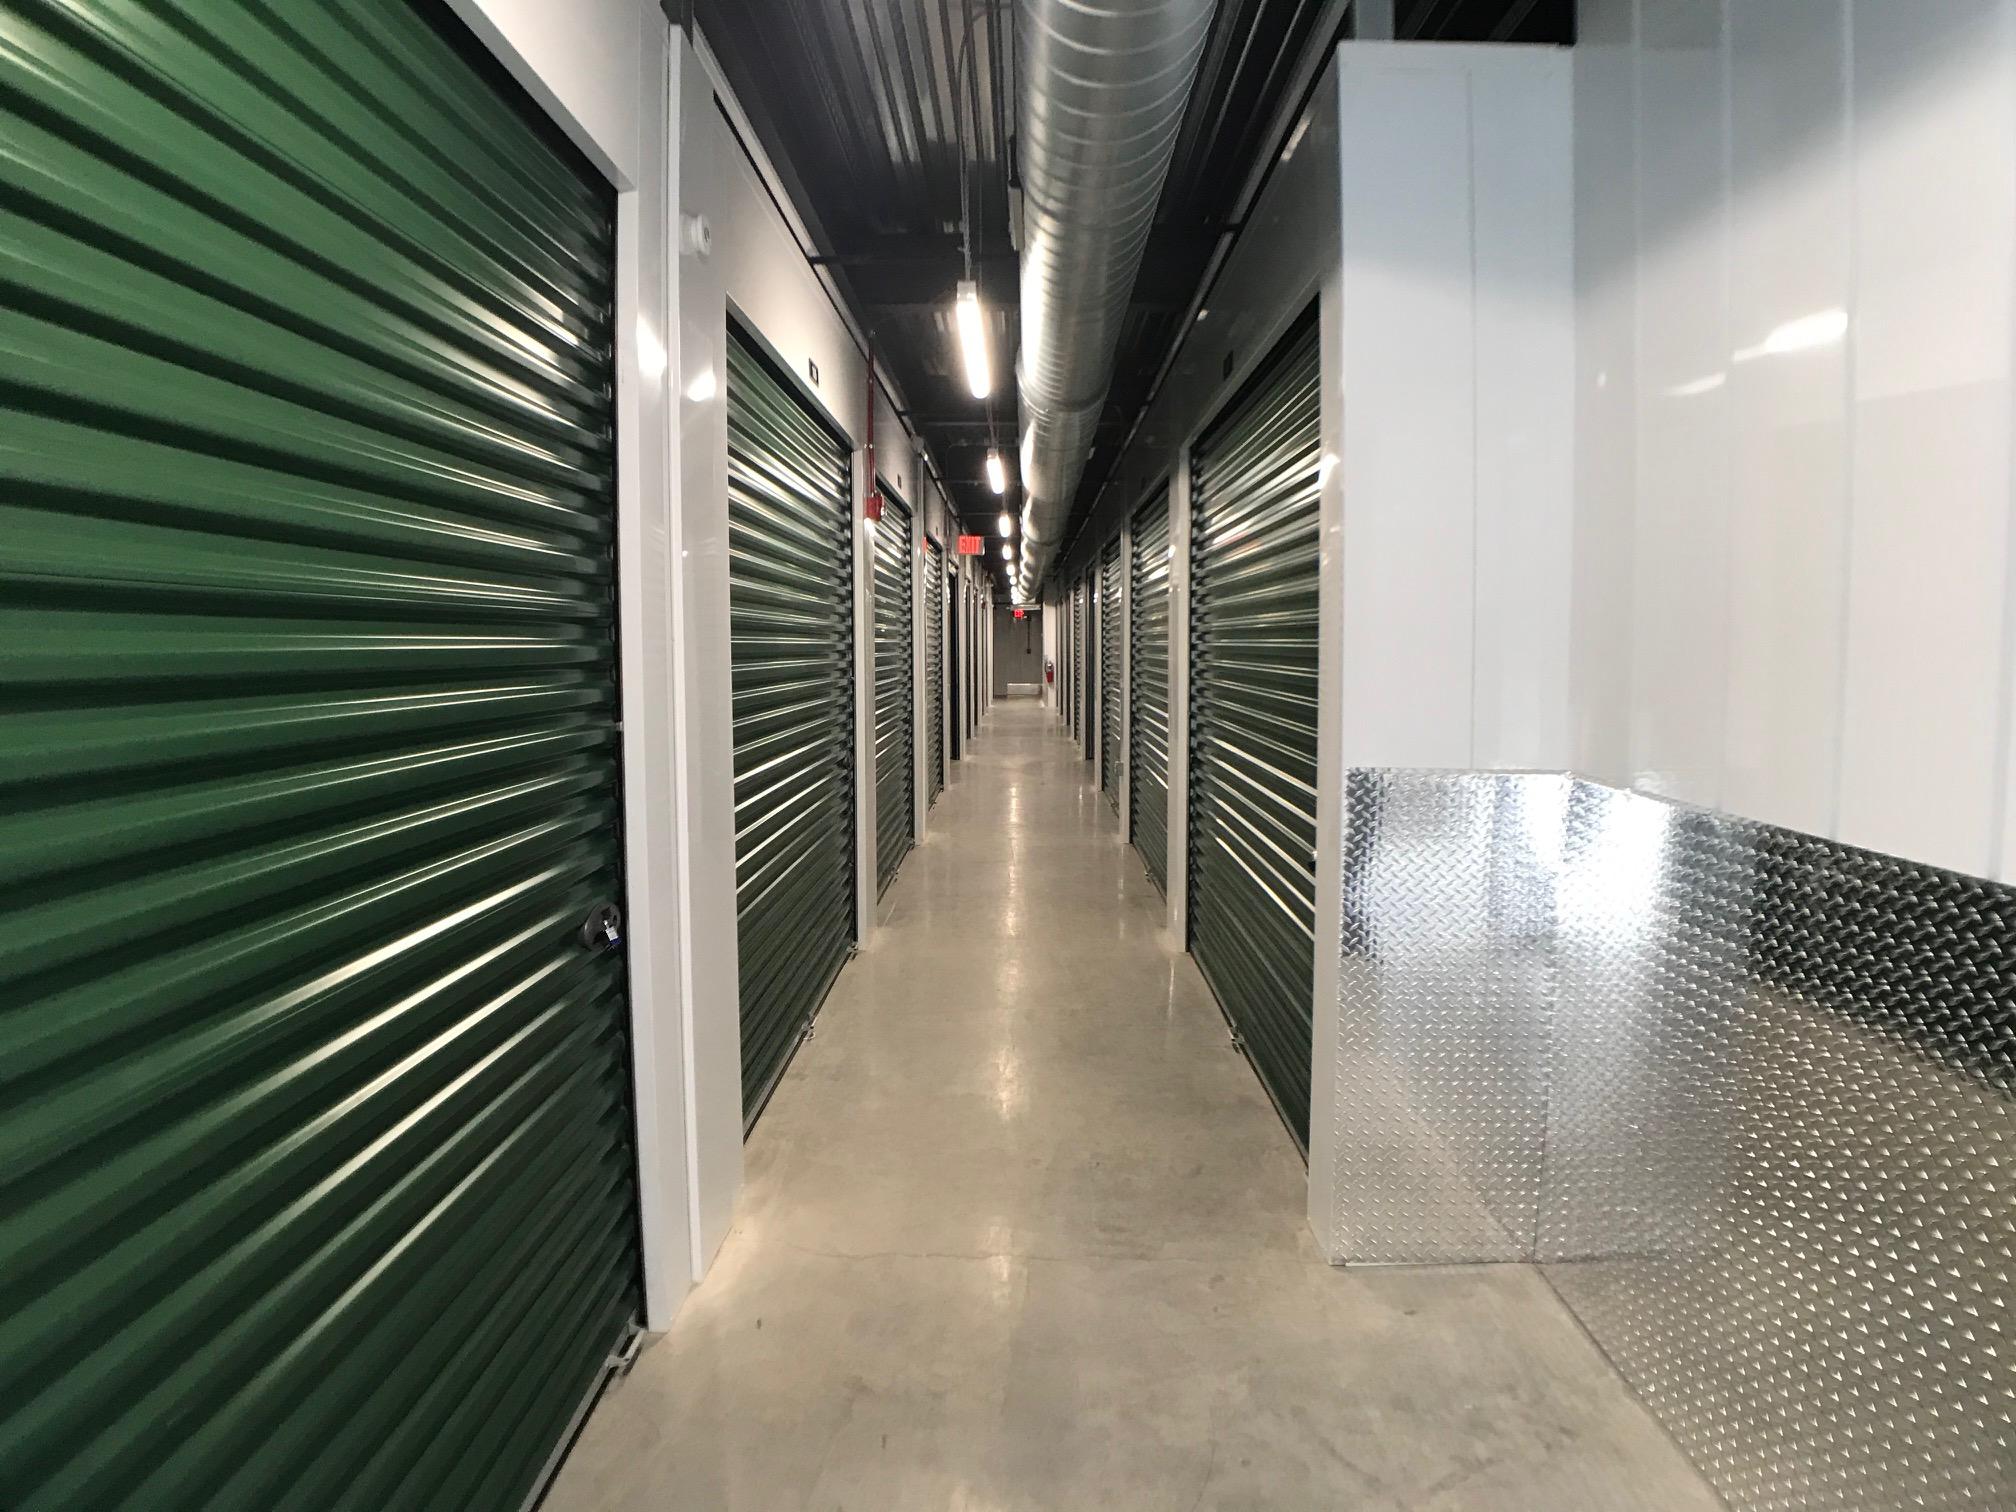 Storage 9 - Indoors